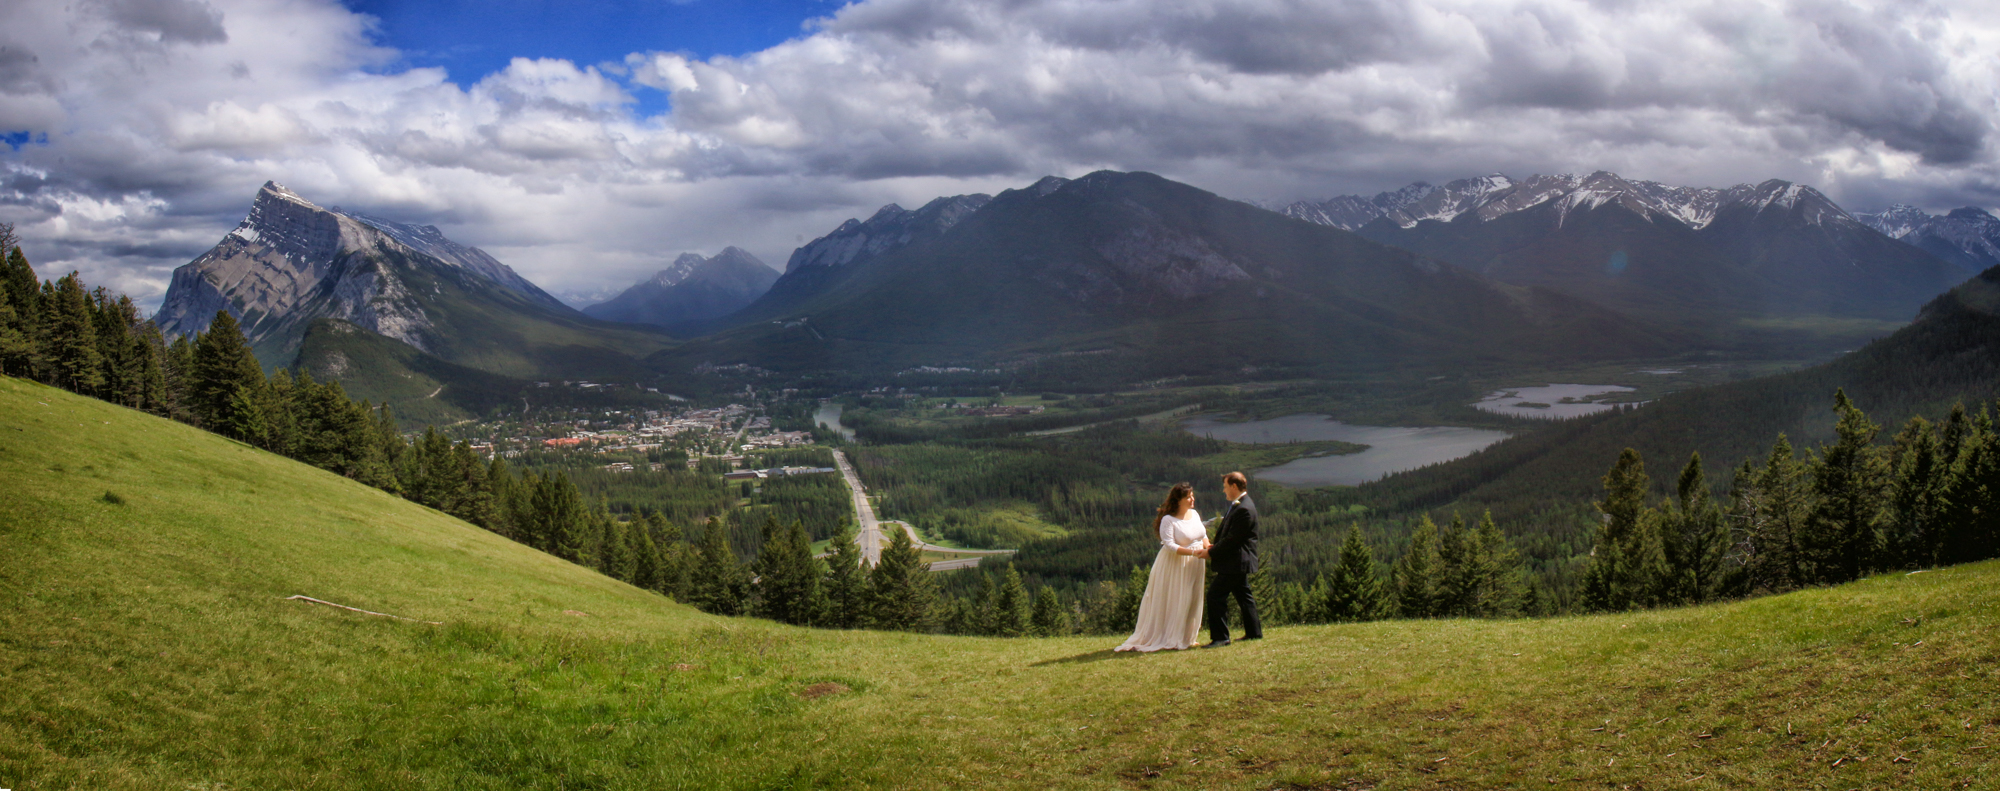 Norquay Meadow Banff National Park Wedding Photographers